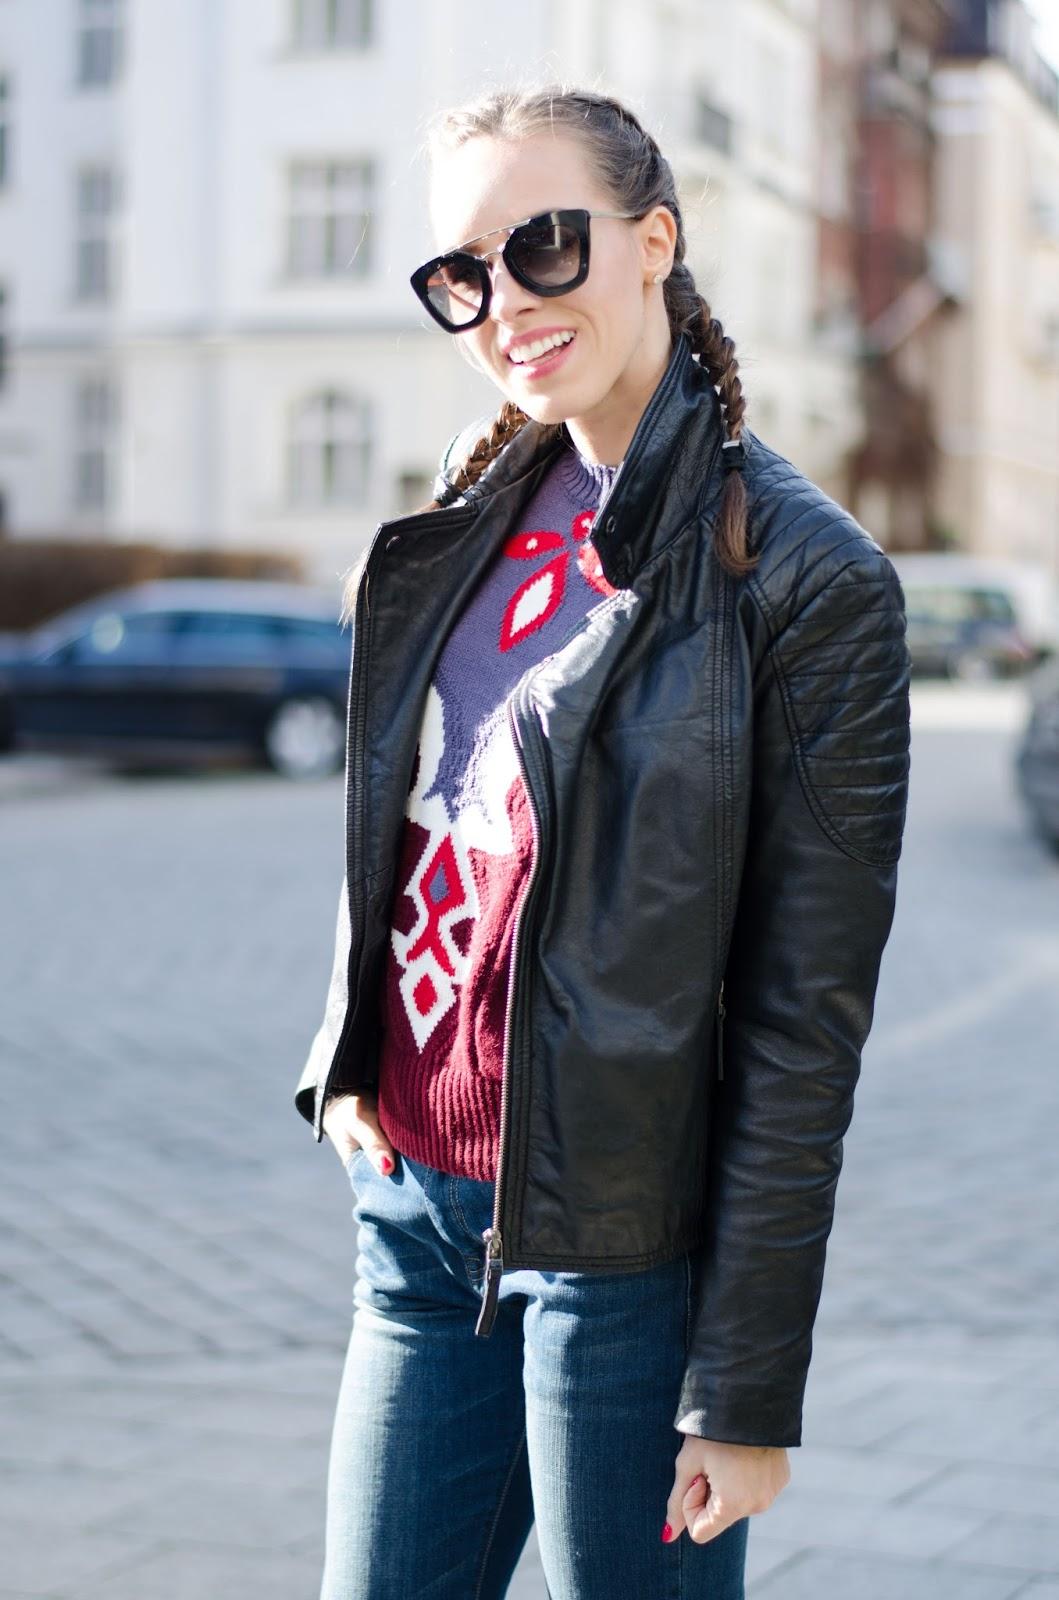 kristjaana mere leather jacket printed sweater french braids